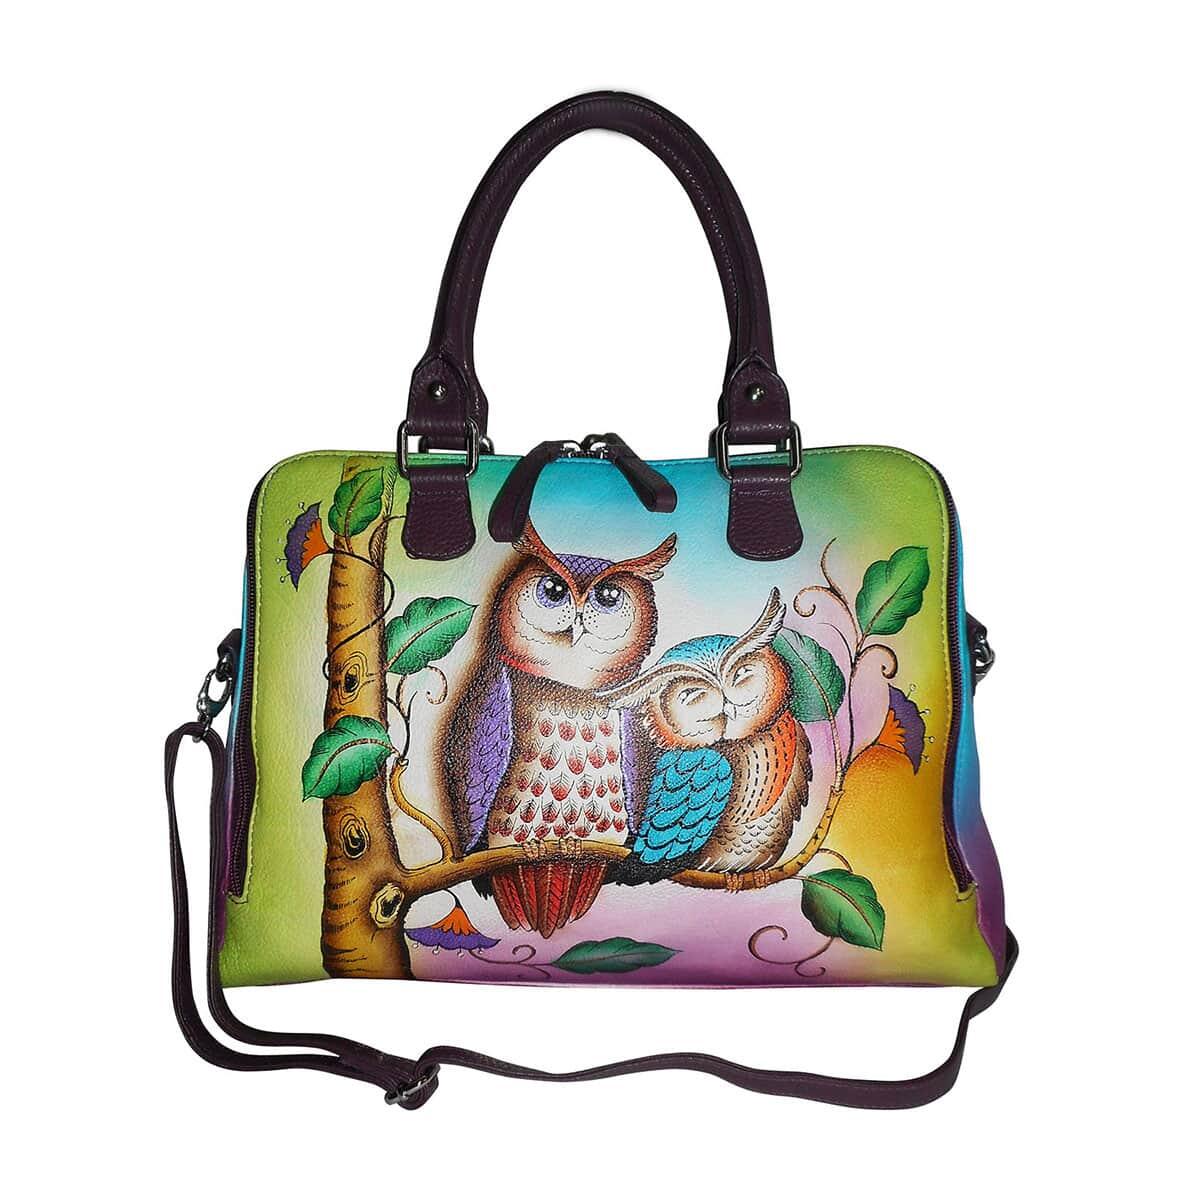 Details About Multi Color Owl Genuine Leather Rfid Crossbody Bag Removable Adjule Strap